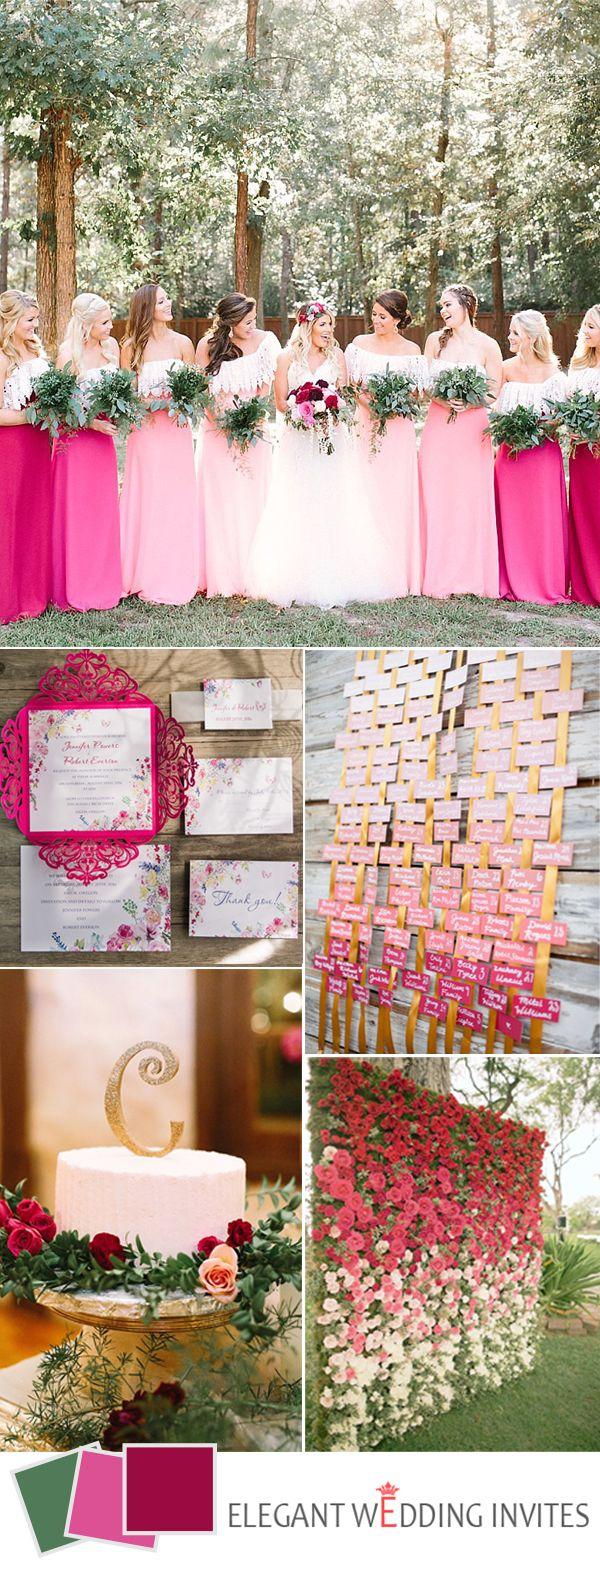 80 best wedding color ideas images on pinterest best wedding 80 best wedding color ideas images on pinterest best wedding colors wedding color palettes and color palettes junglespirit Images